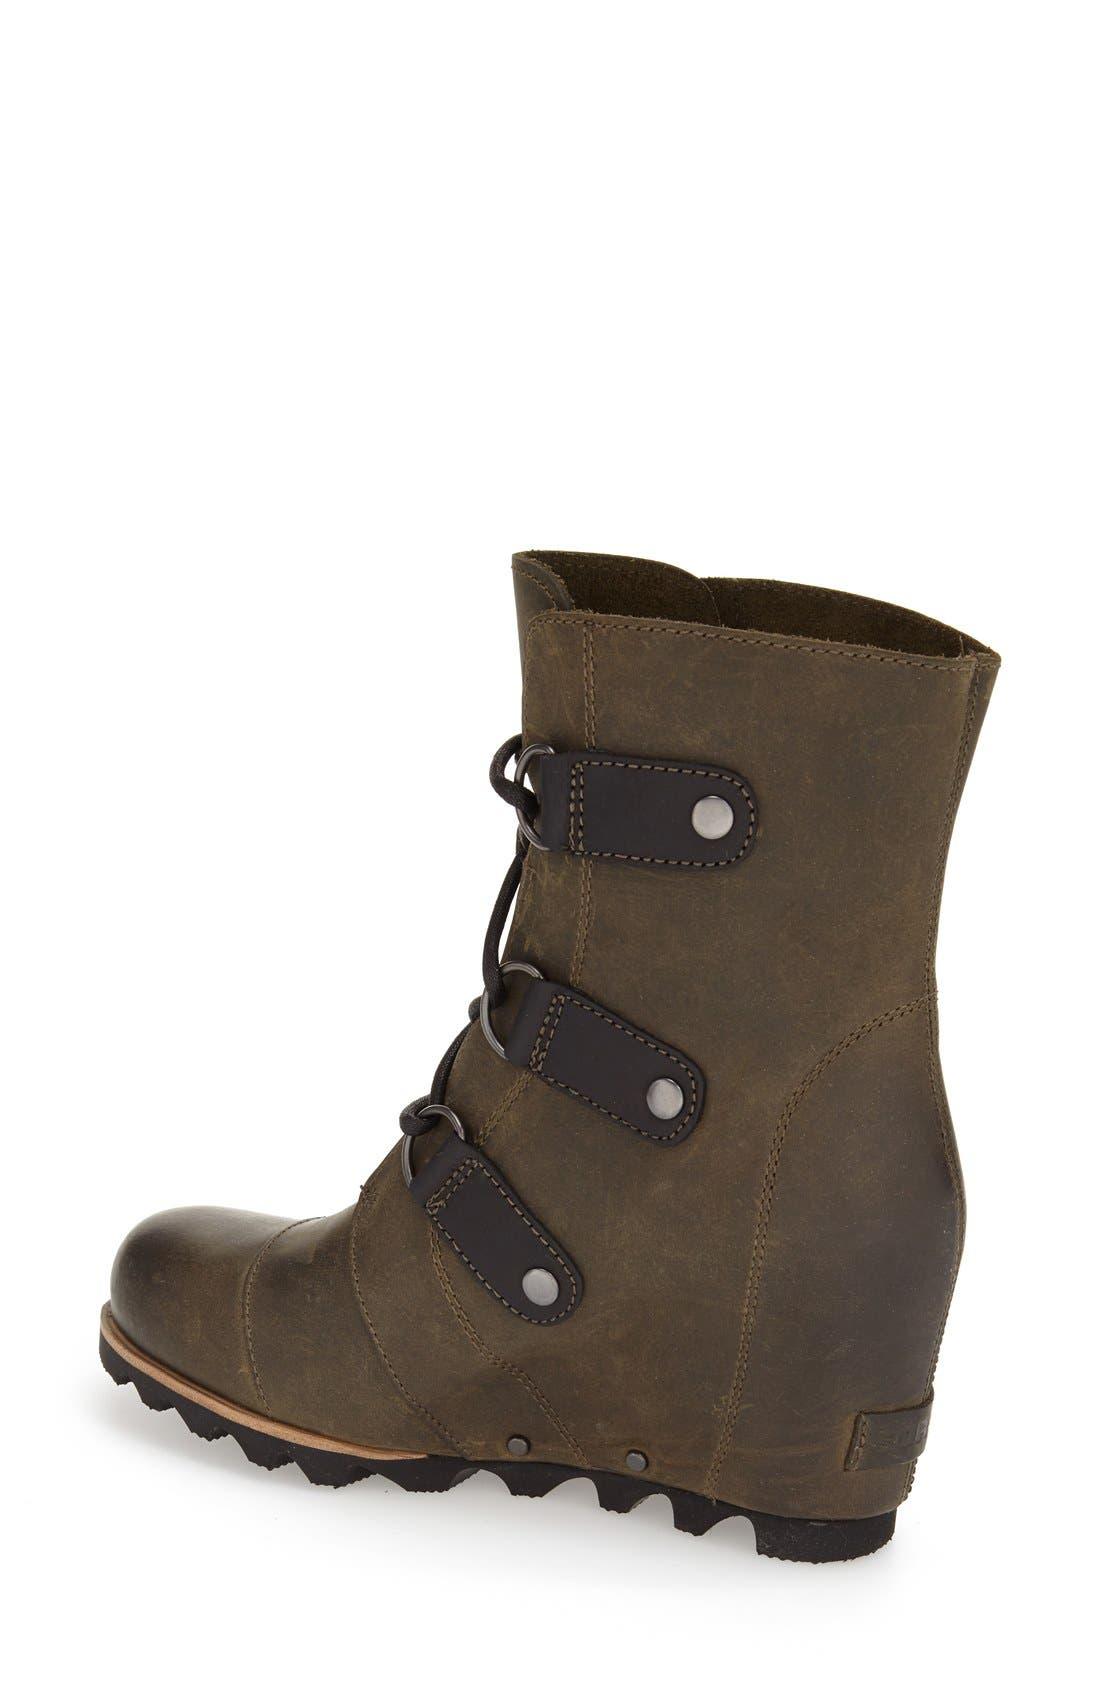 'Joan of Arctic' Waterproof Wedge Boot,                             Alternate thumbnail 2, color,                             Nori Green Leather